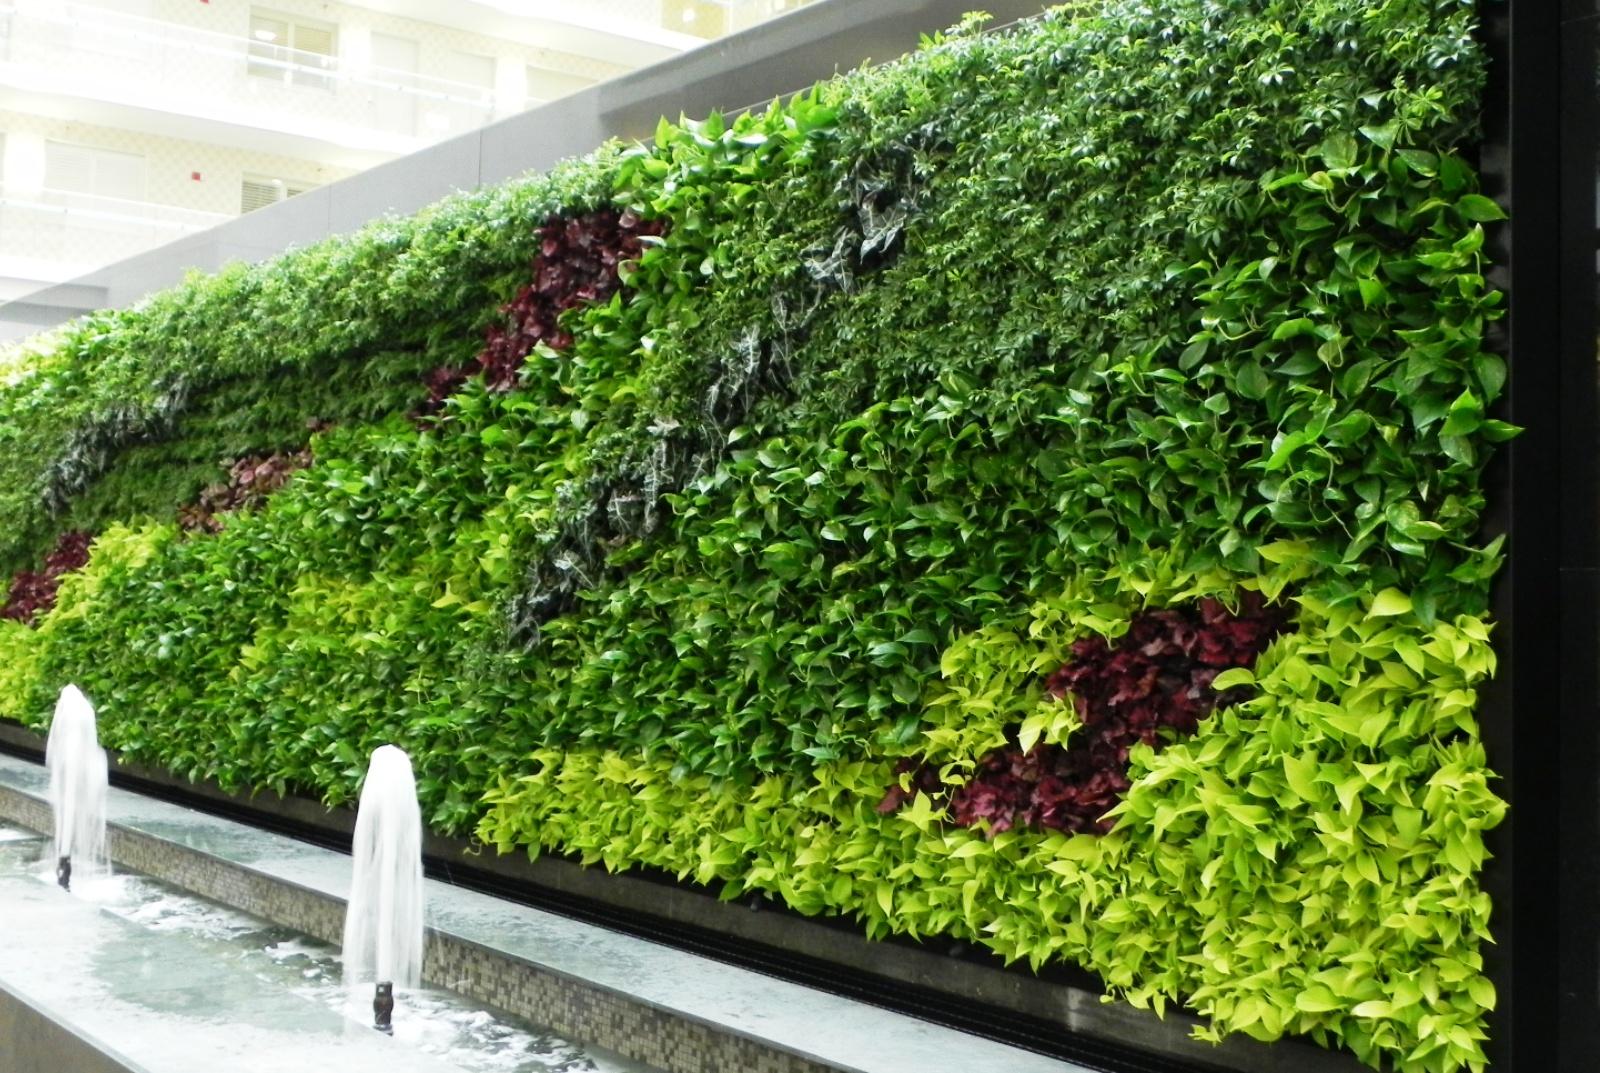 zeleni-zid-vertikalni-vrt-zelena-fasada-green-centar